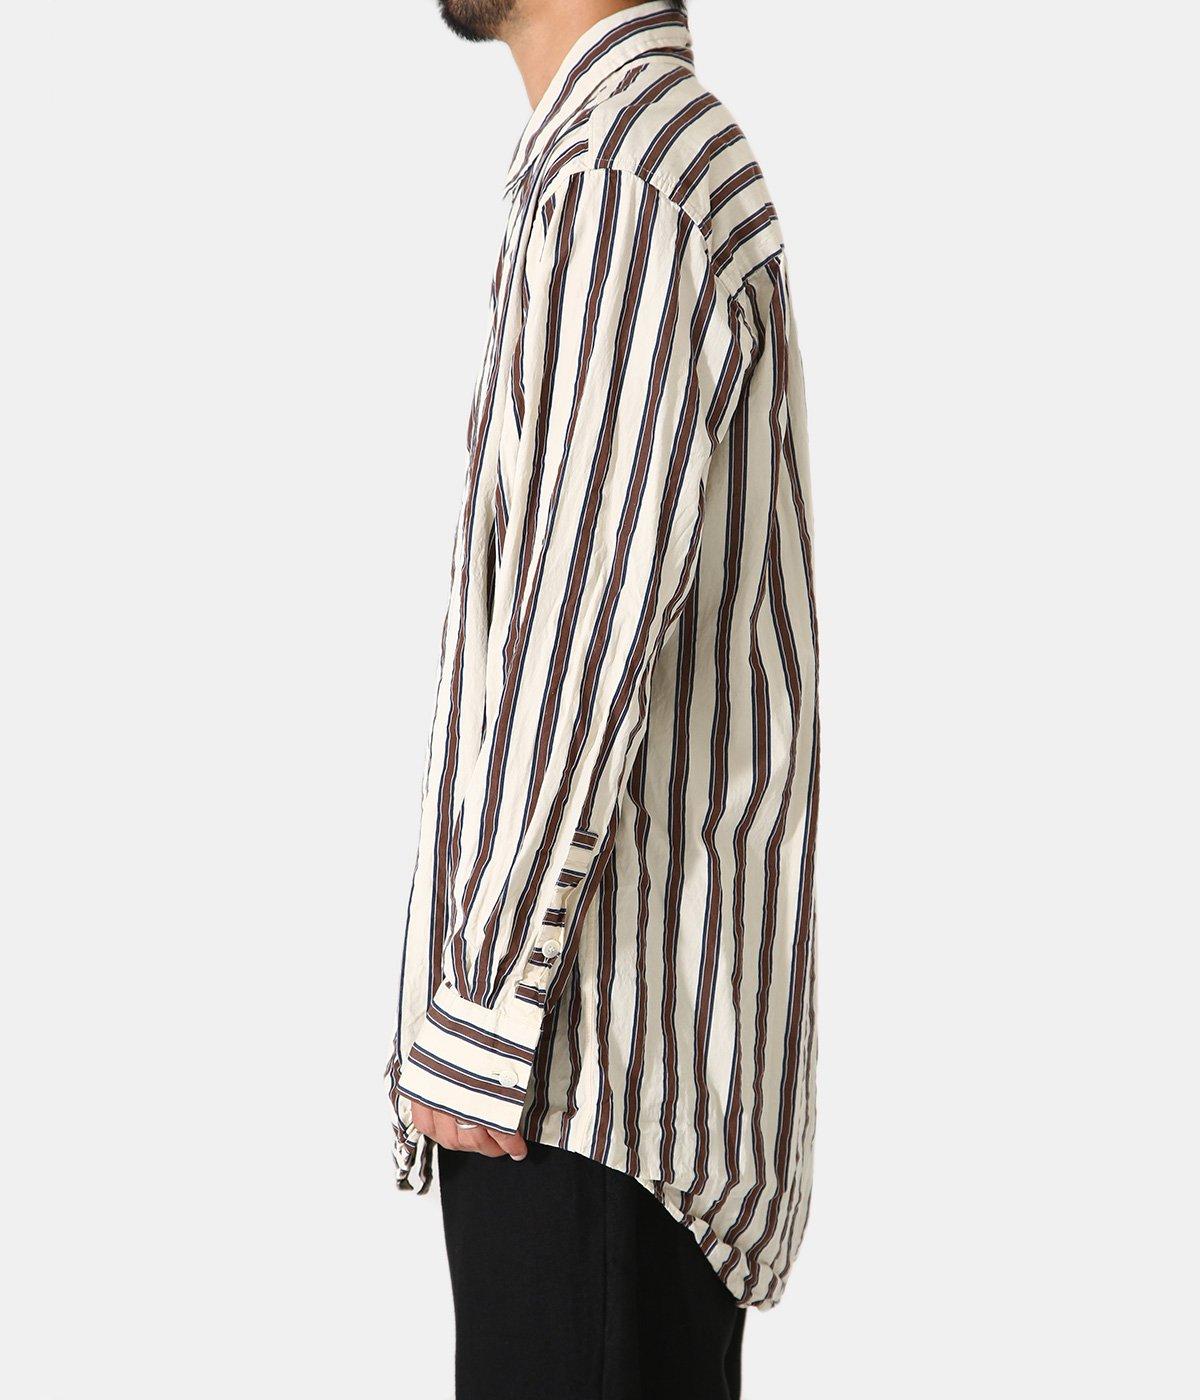 FABIANO SHIRT - stripe -